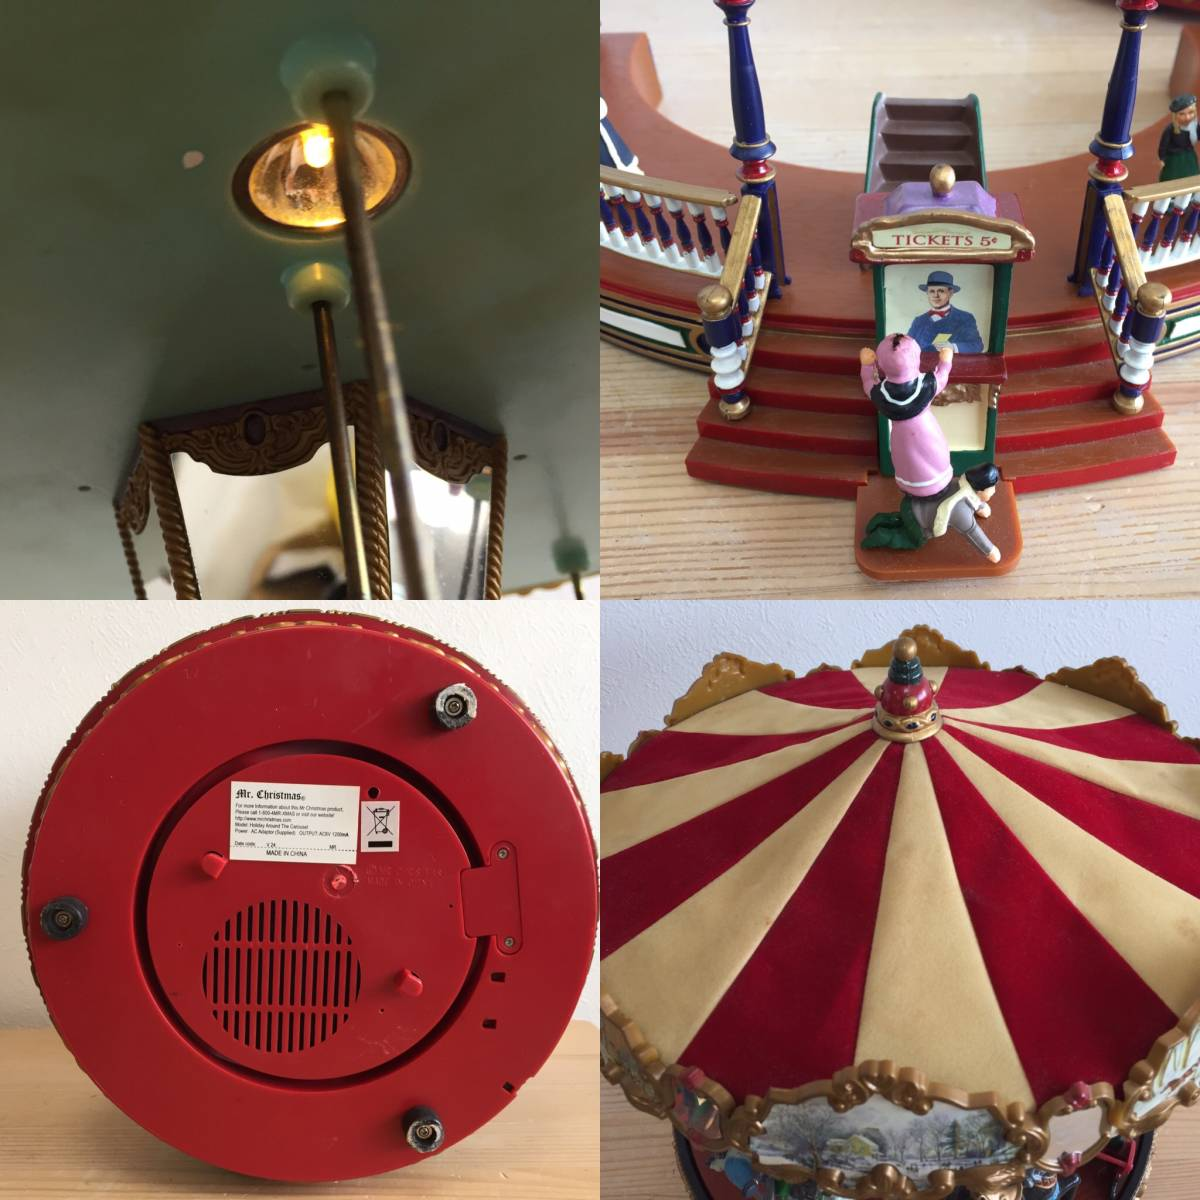 MR CHRISTMAS メリーゴーランド The Carousel ミスタークリスマス ホリデーアラウンド ザ カルーセル 15曲 動作確認済み レア 1806293_画像5